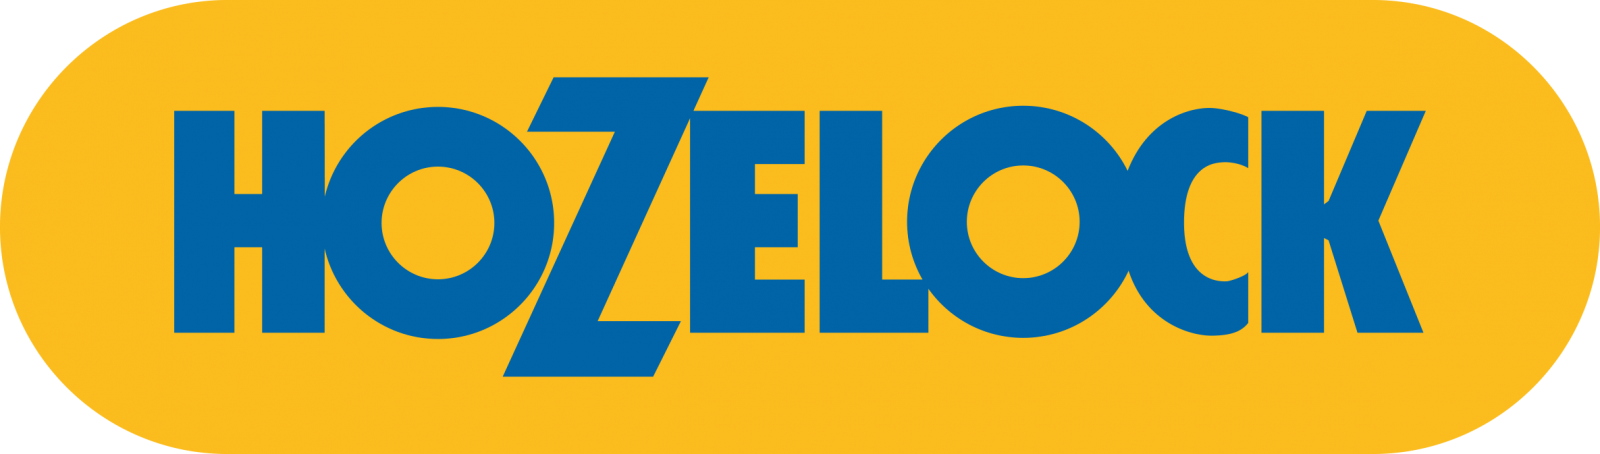 Hozelock International